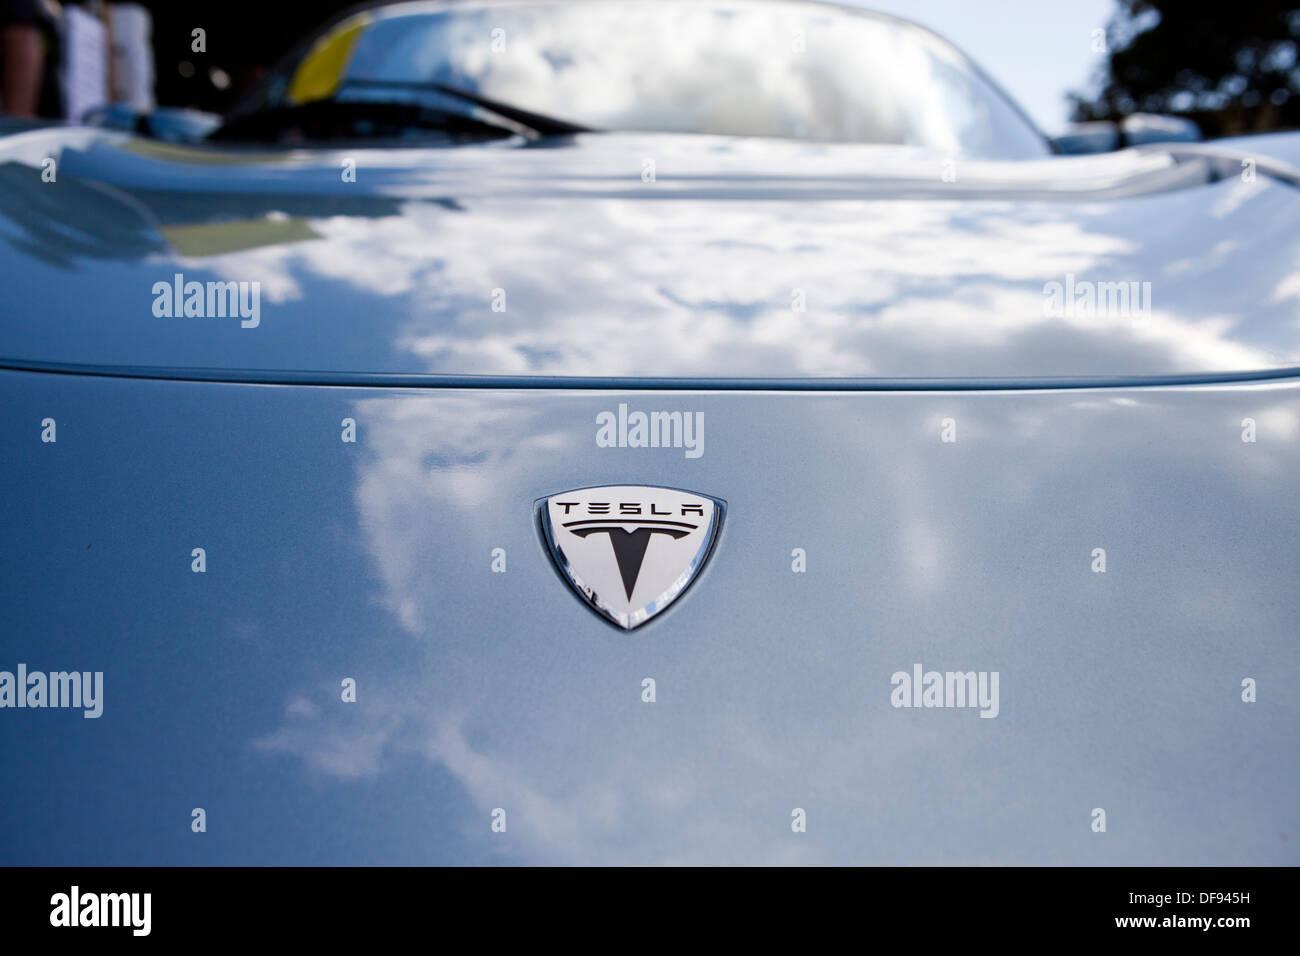 Tesla Roadster electric car hood badging - Stock Image